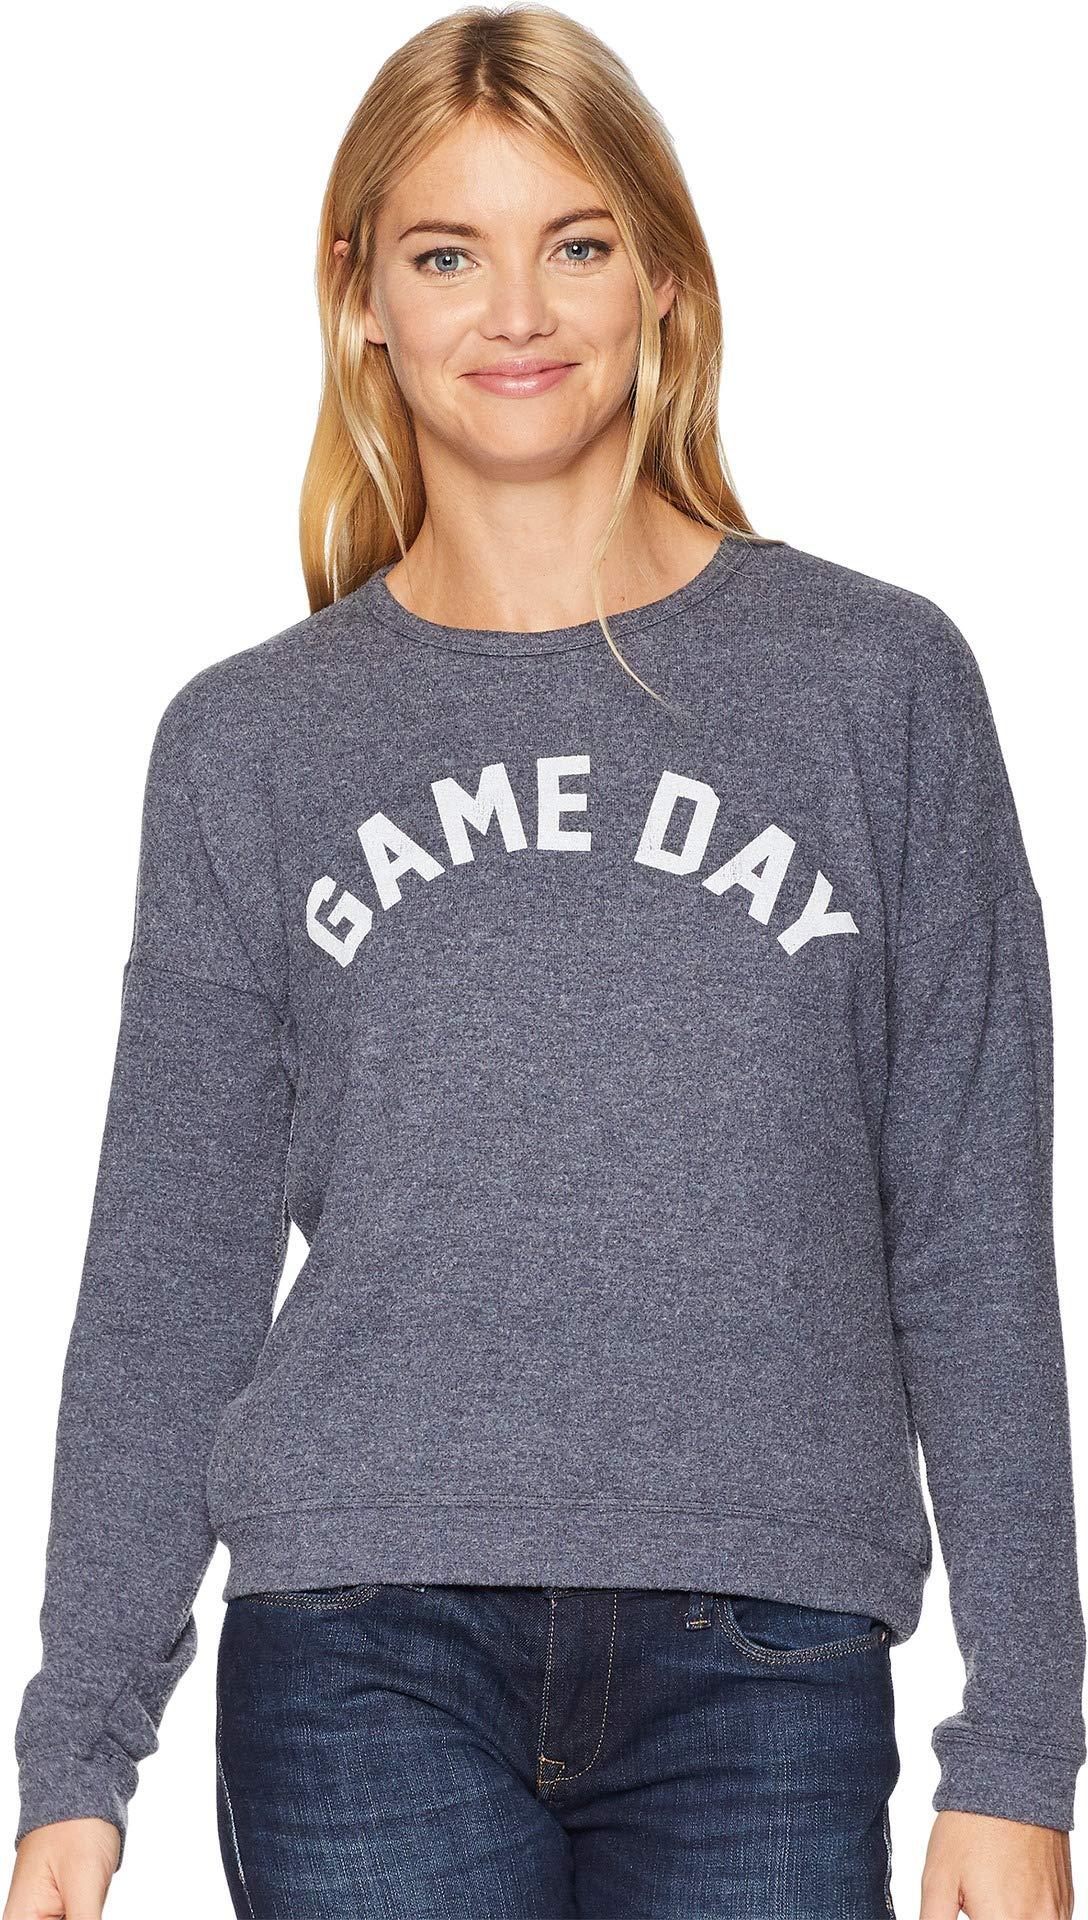 Original Retro Brand The Women's Game Day Super Soft Hacci Pullover Navy Haaci Large by Original Retro Brand (Image #1)